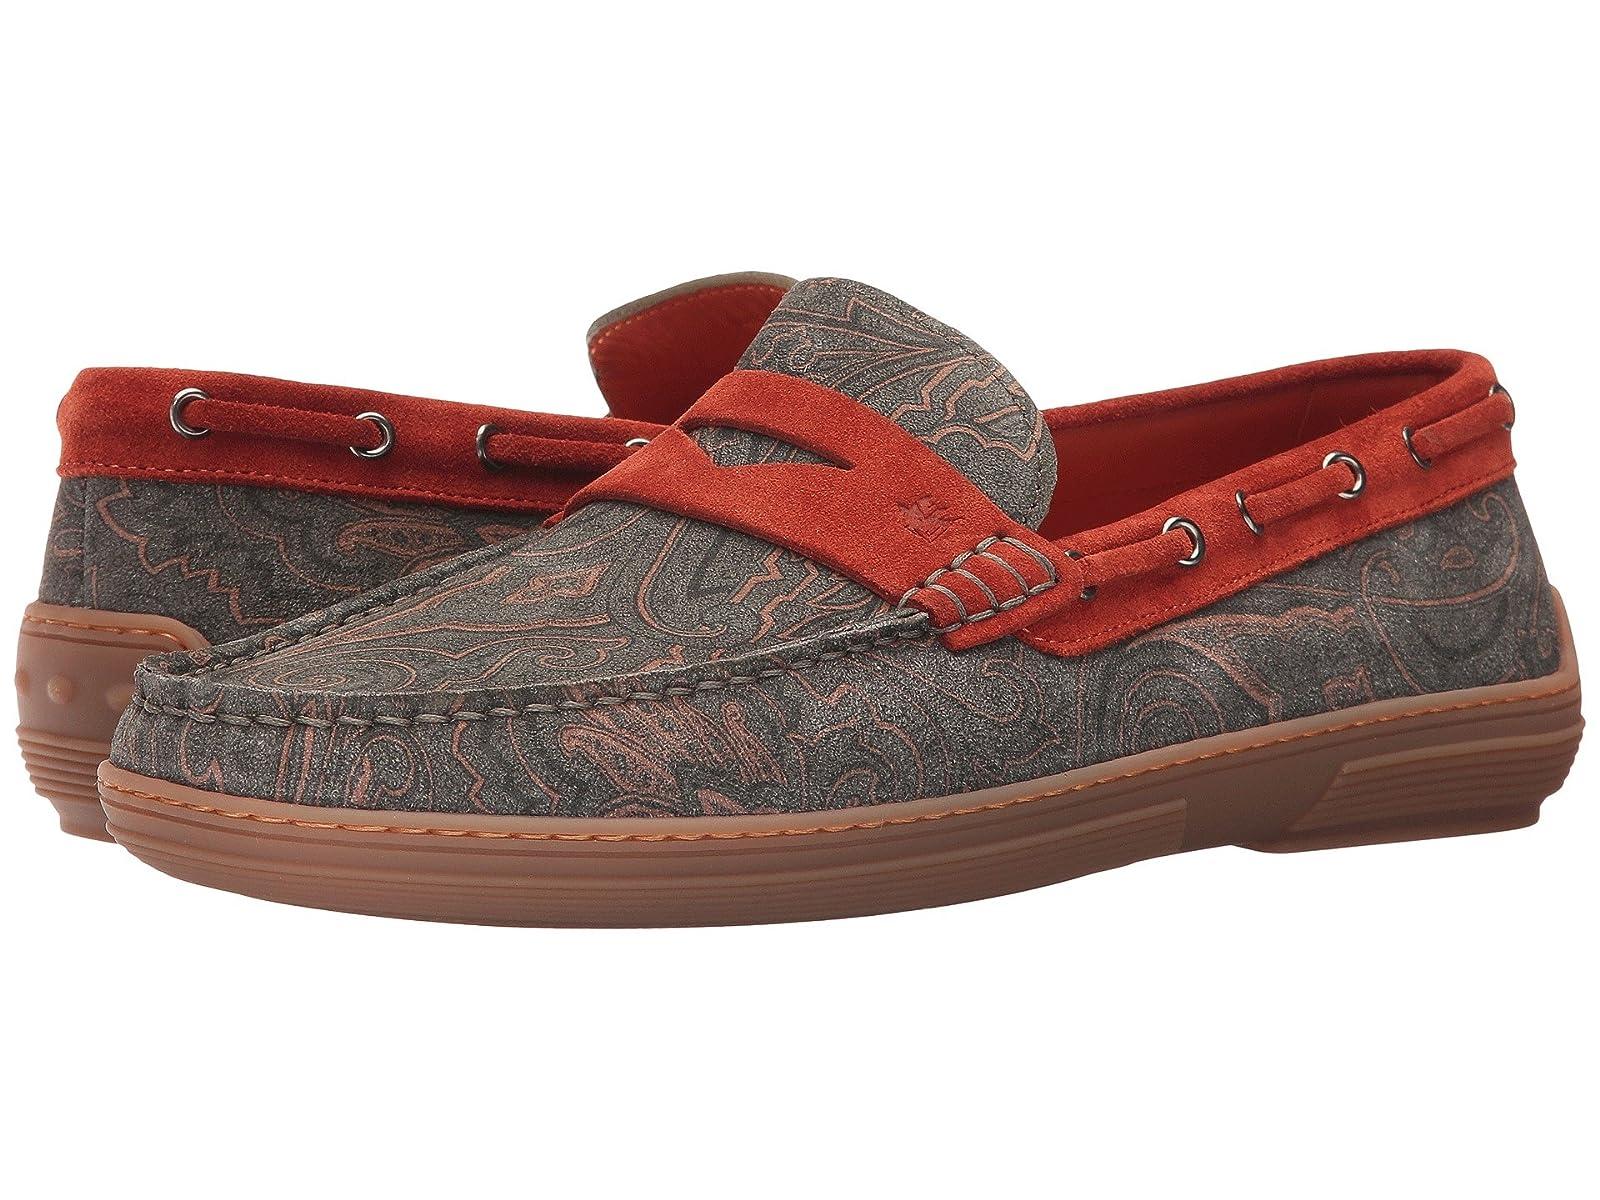 Etro Paisley Boat ShoeCheap and distinctive eye-catching shoes